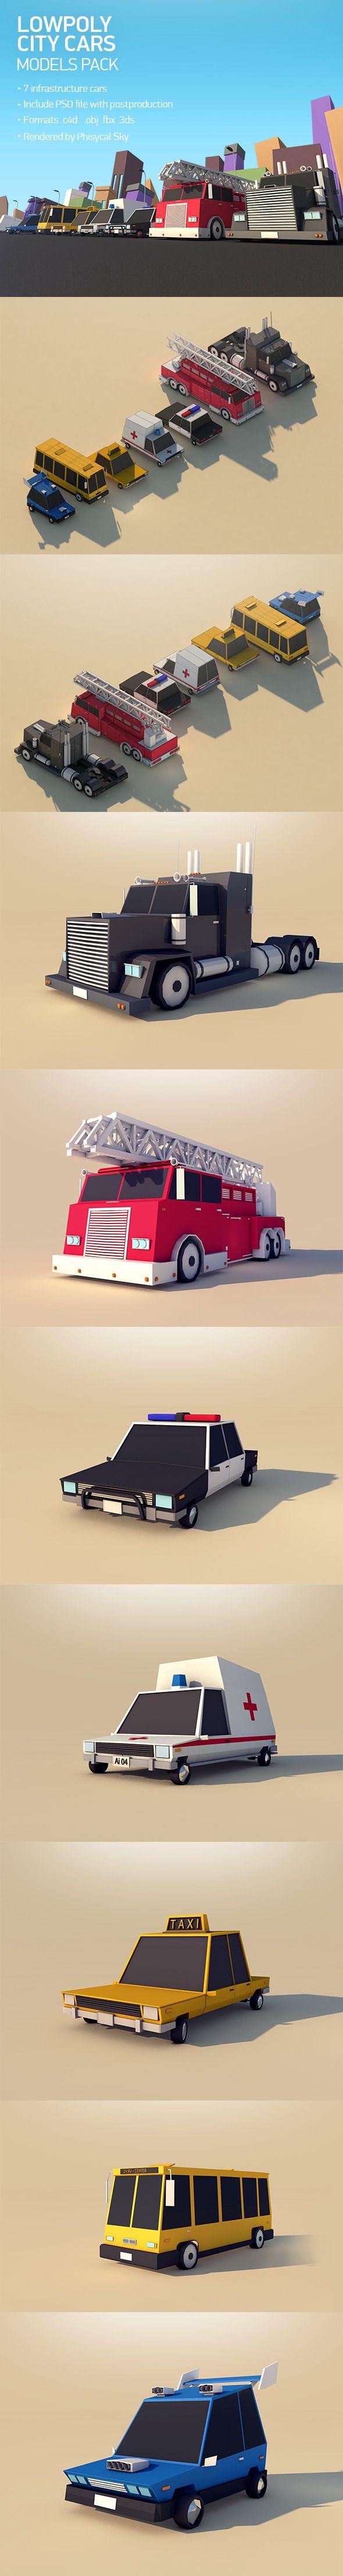 Low Poly City Cars Pack 1 3D Models Design Template .3ds .c4d .obj .fbx #cinema4d #3D #3dDesign Download here: https://3docean.net/item/low-poly-city-cars-pack-1/11993451?ref=yinkira